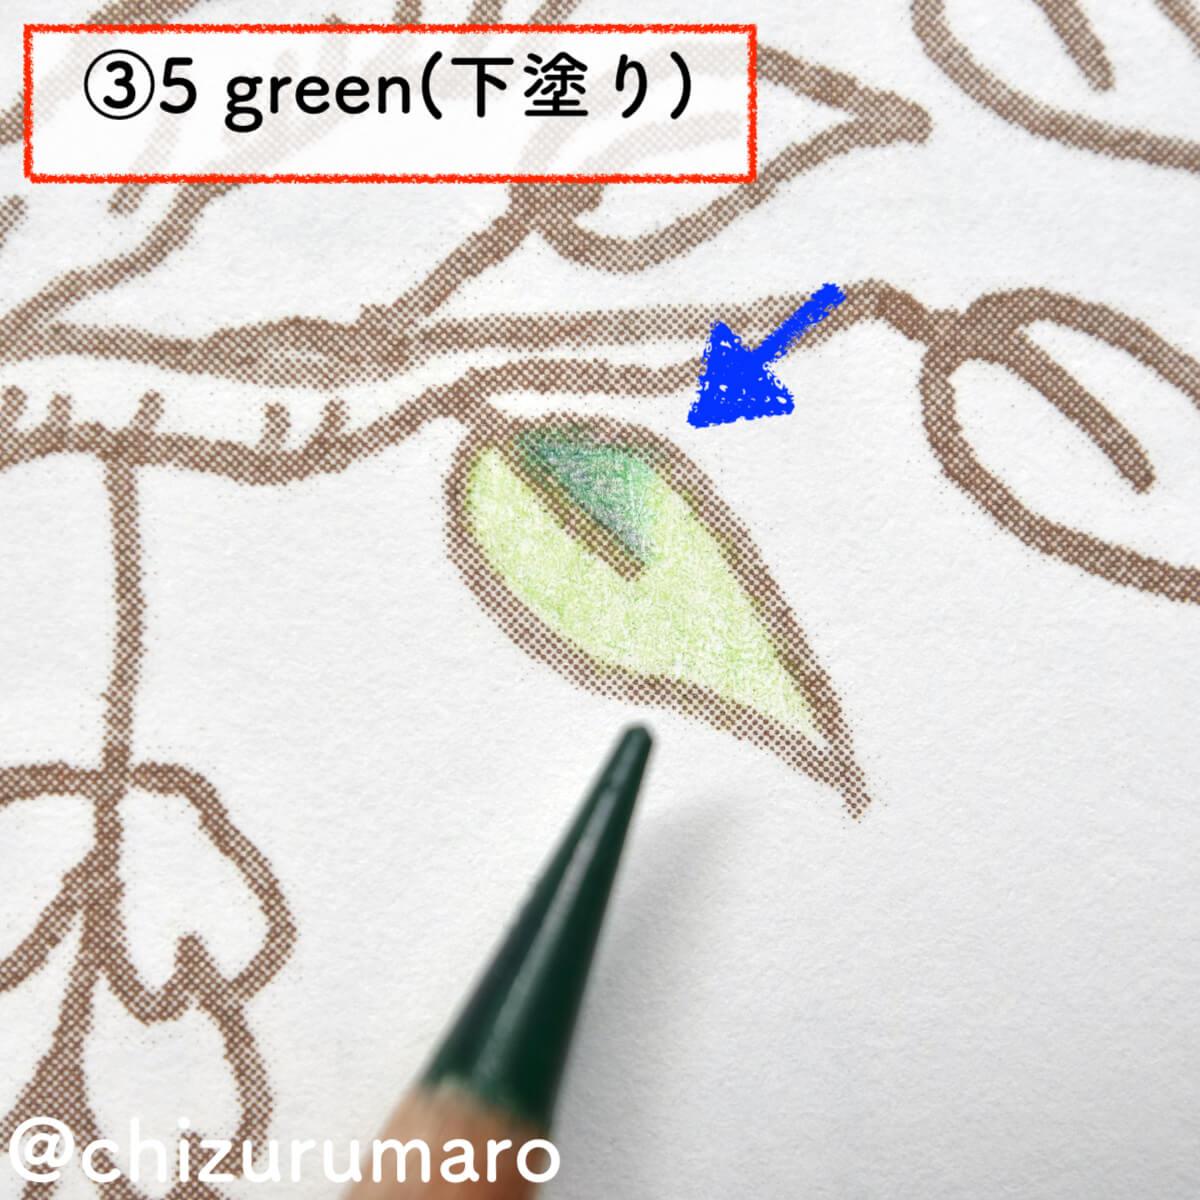 f:id:chizurumaro:20201105212521j:plain